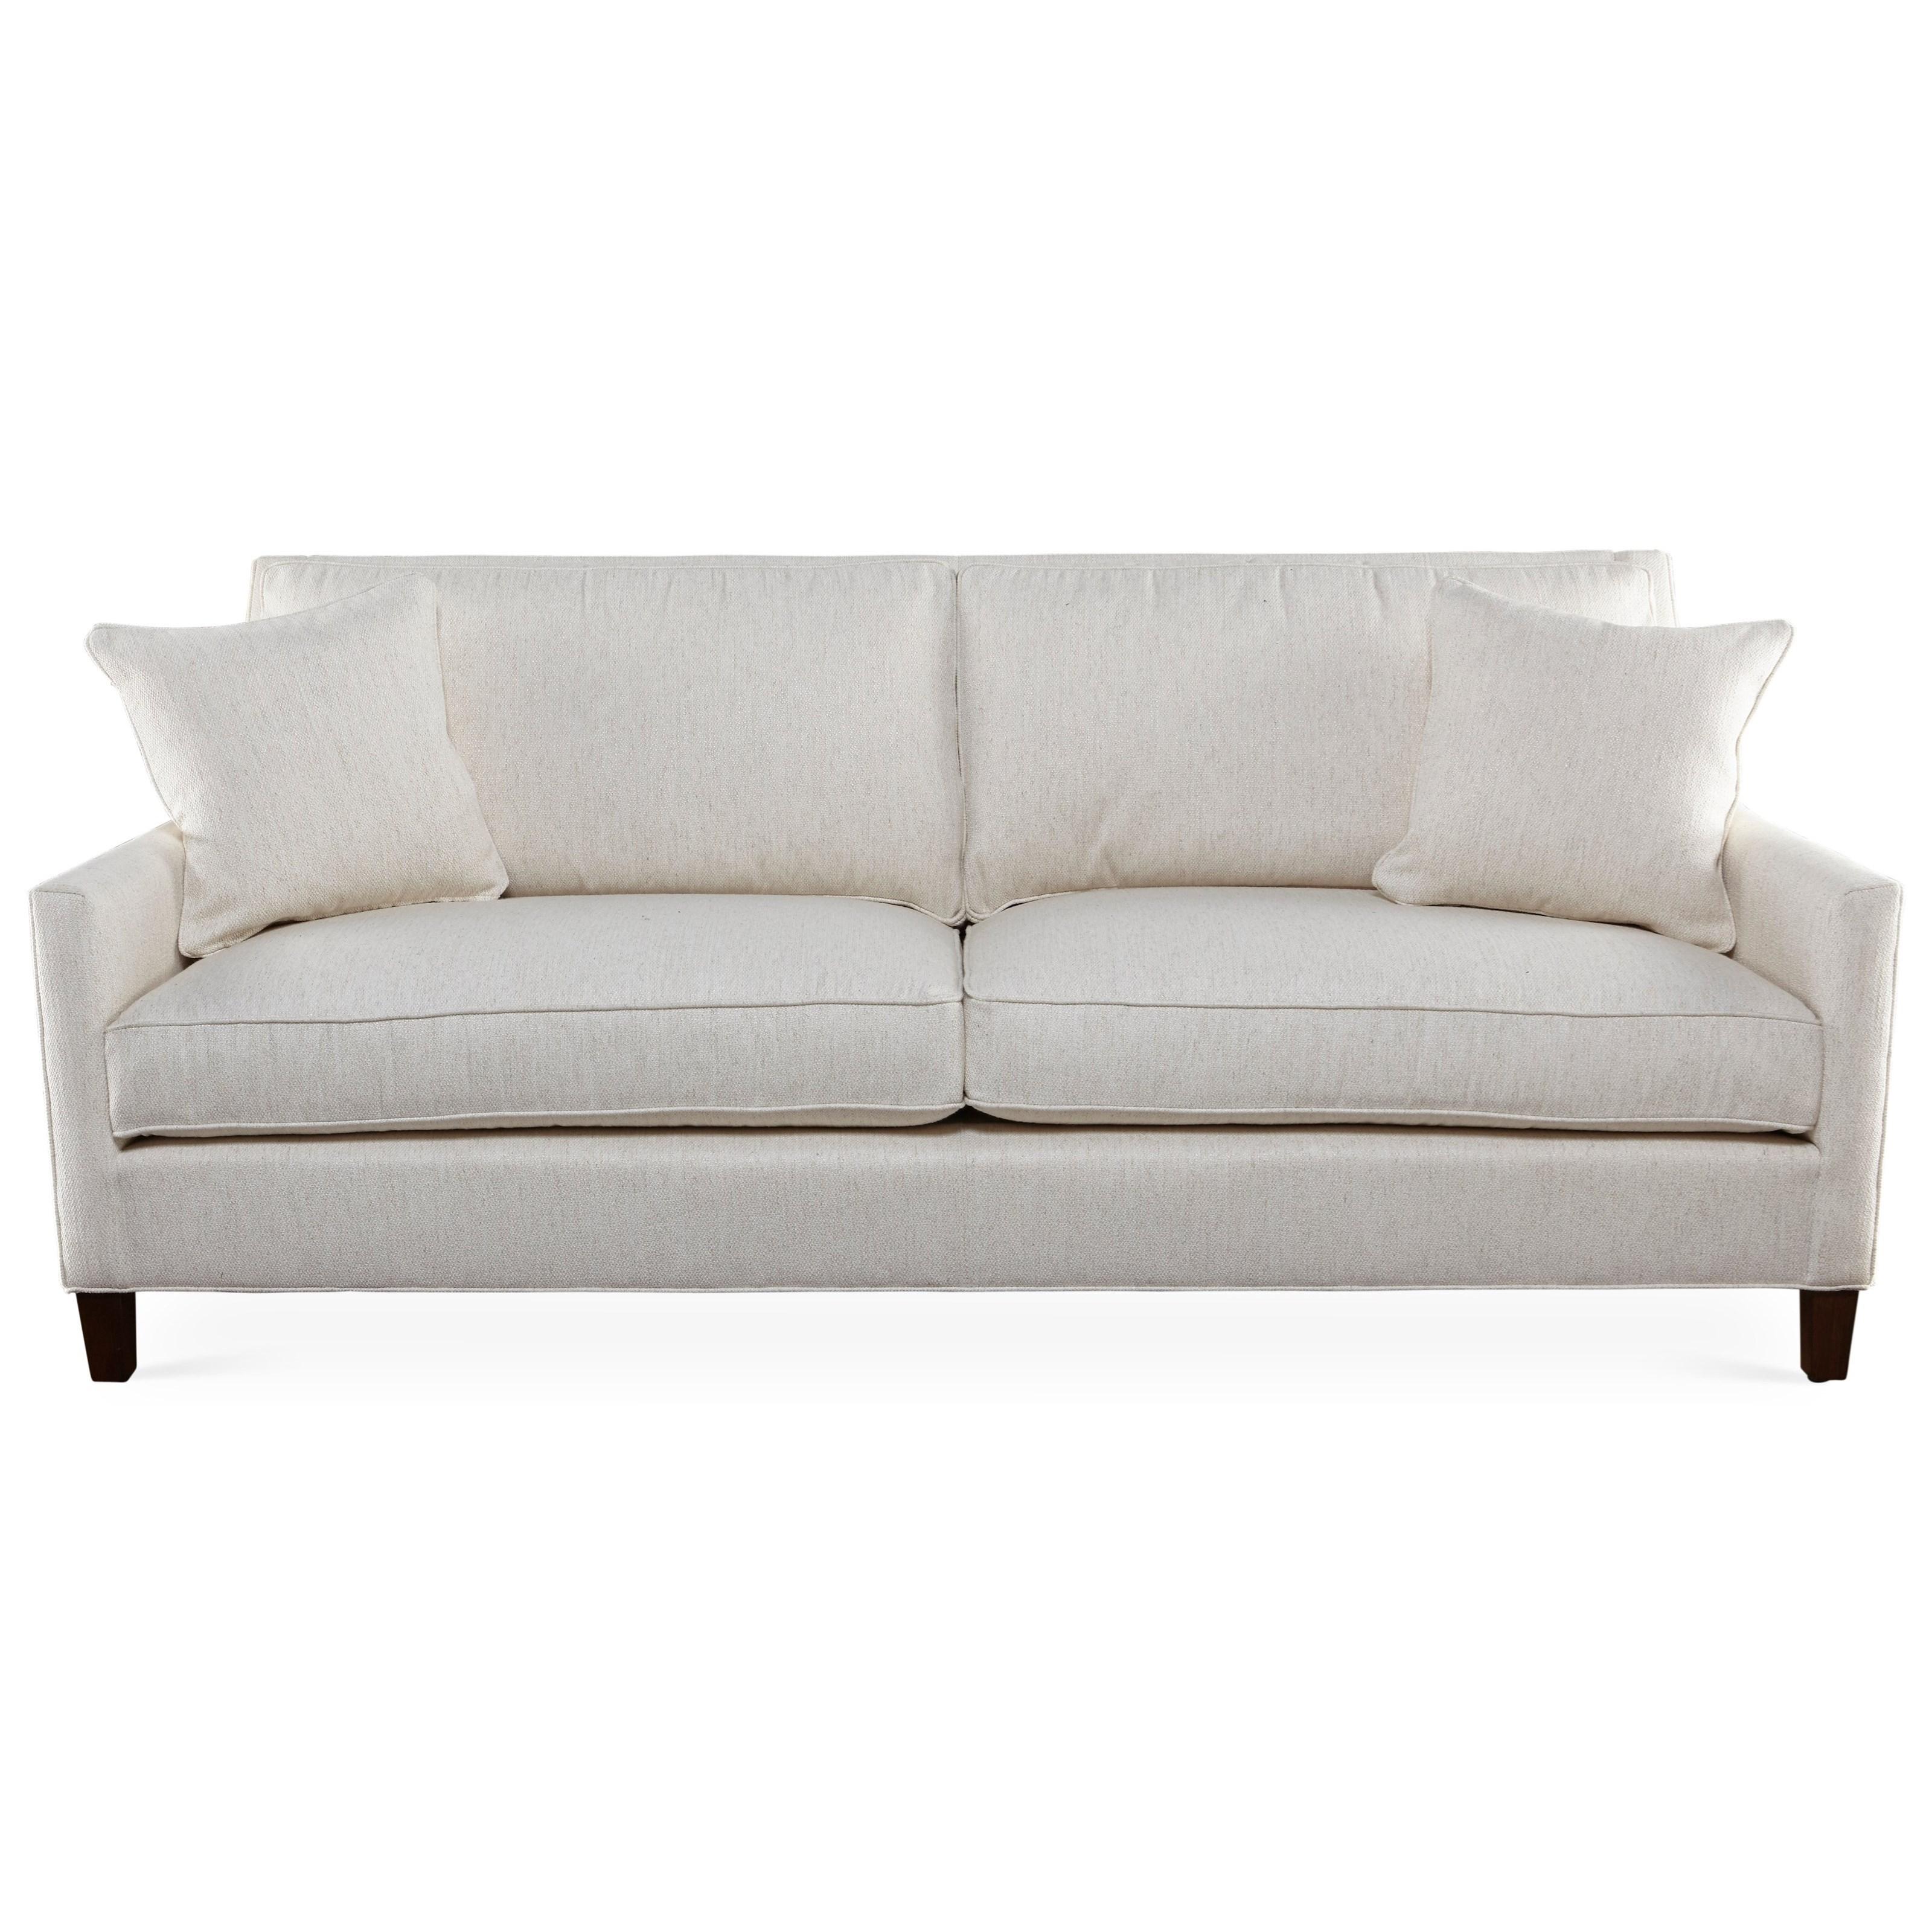 Lincoln Stationary Sofa by Miles Talbott at Alison Craig Home Furnishings